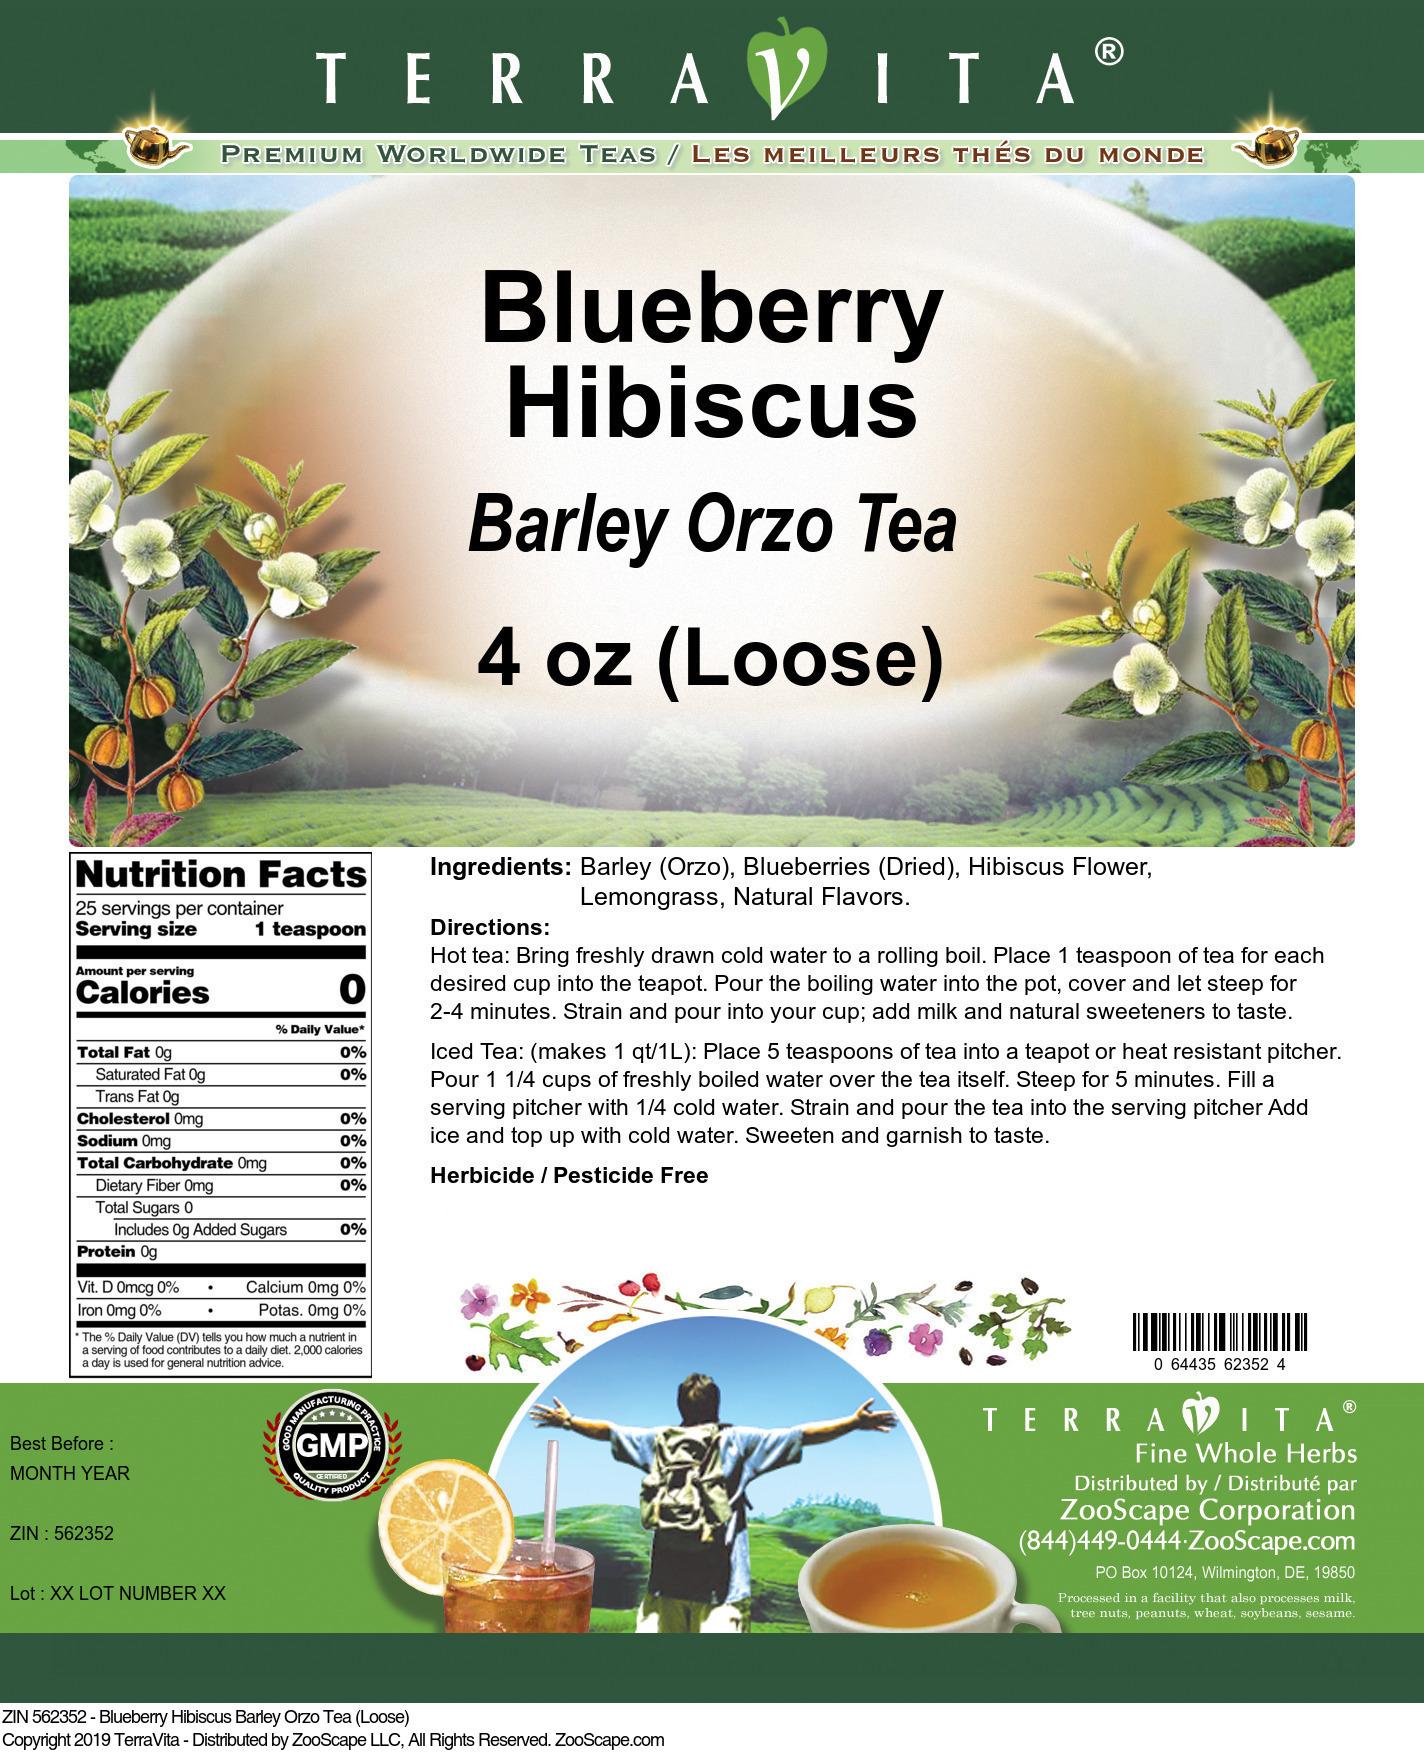 Blueberry Hibiscus Barley Orzo Tea (Loose)